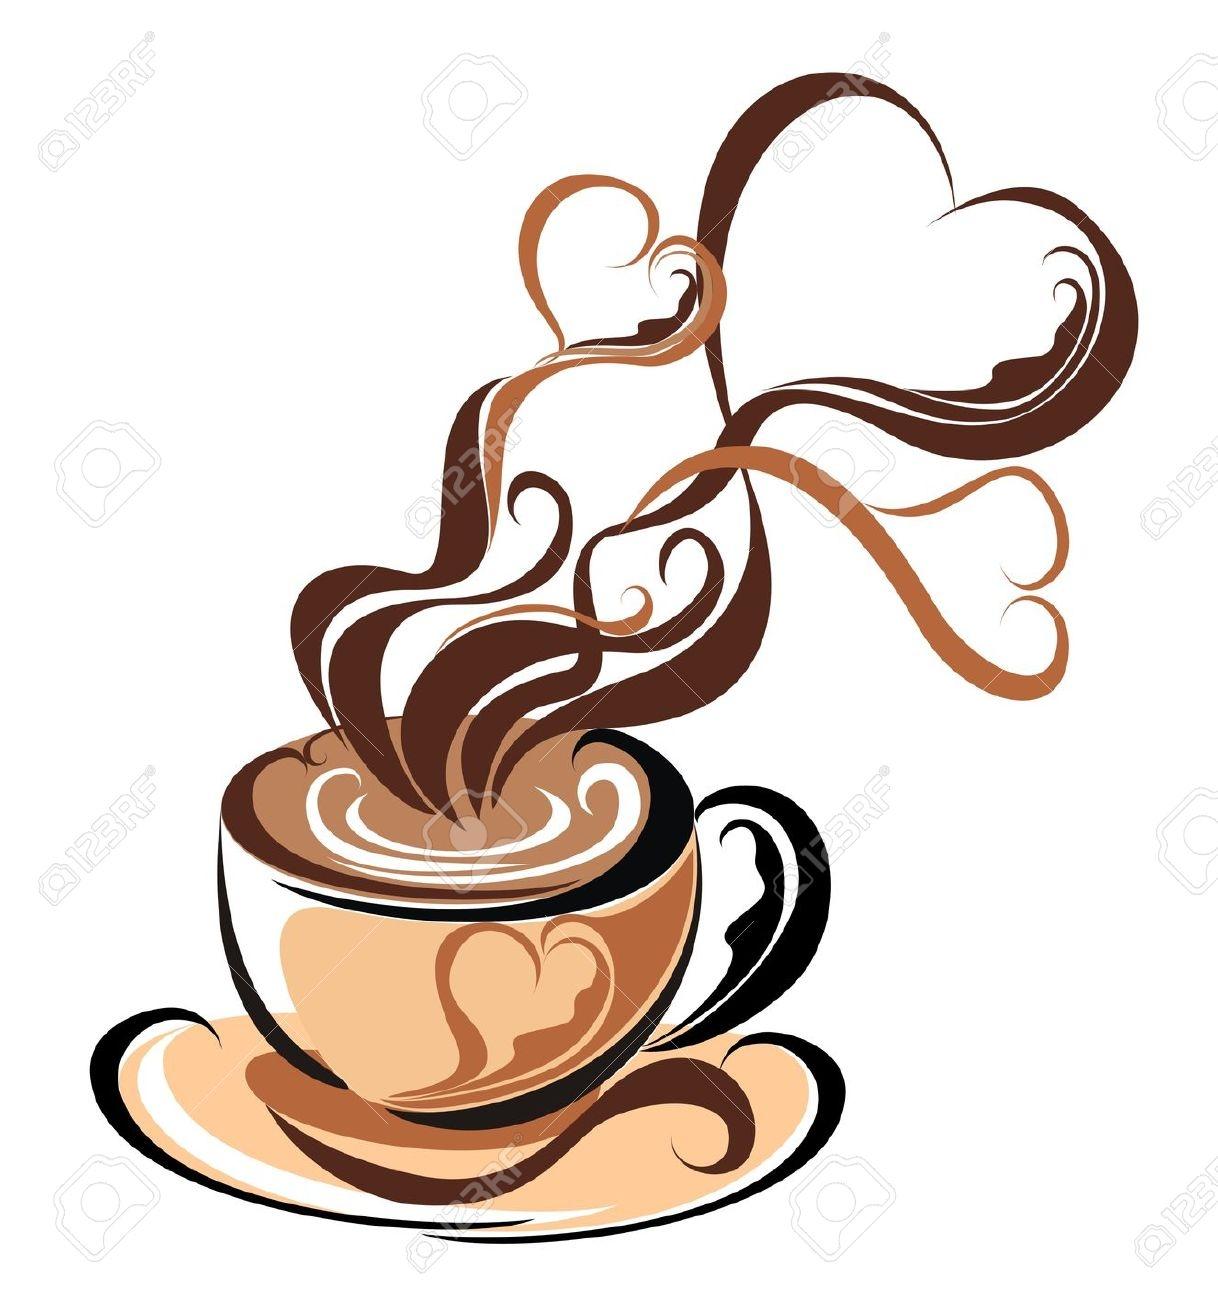 coffee mug with heart png transparent coffee mug with